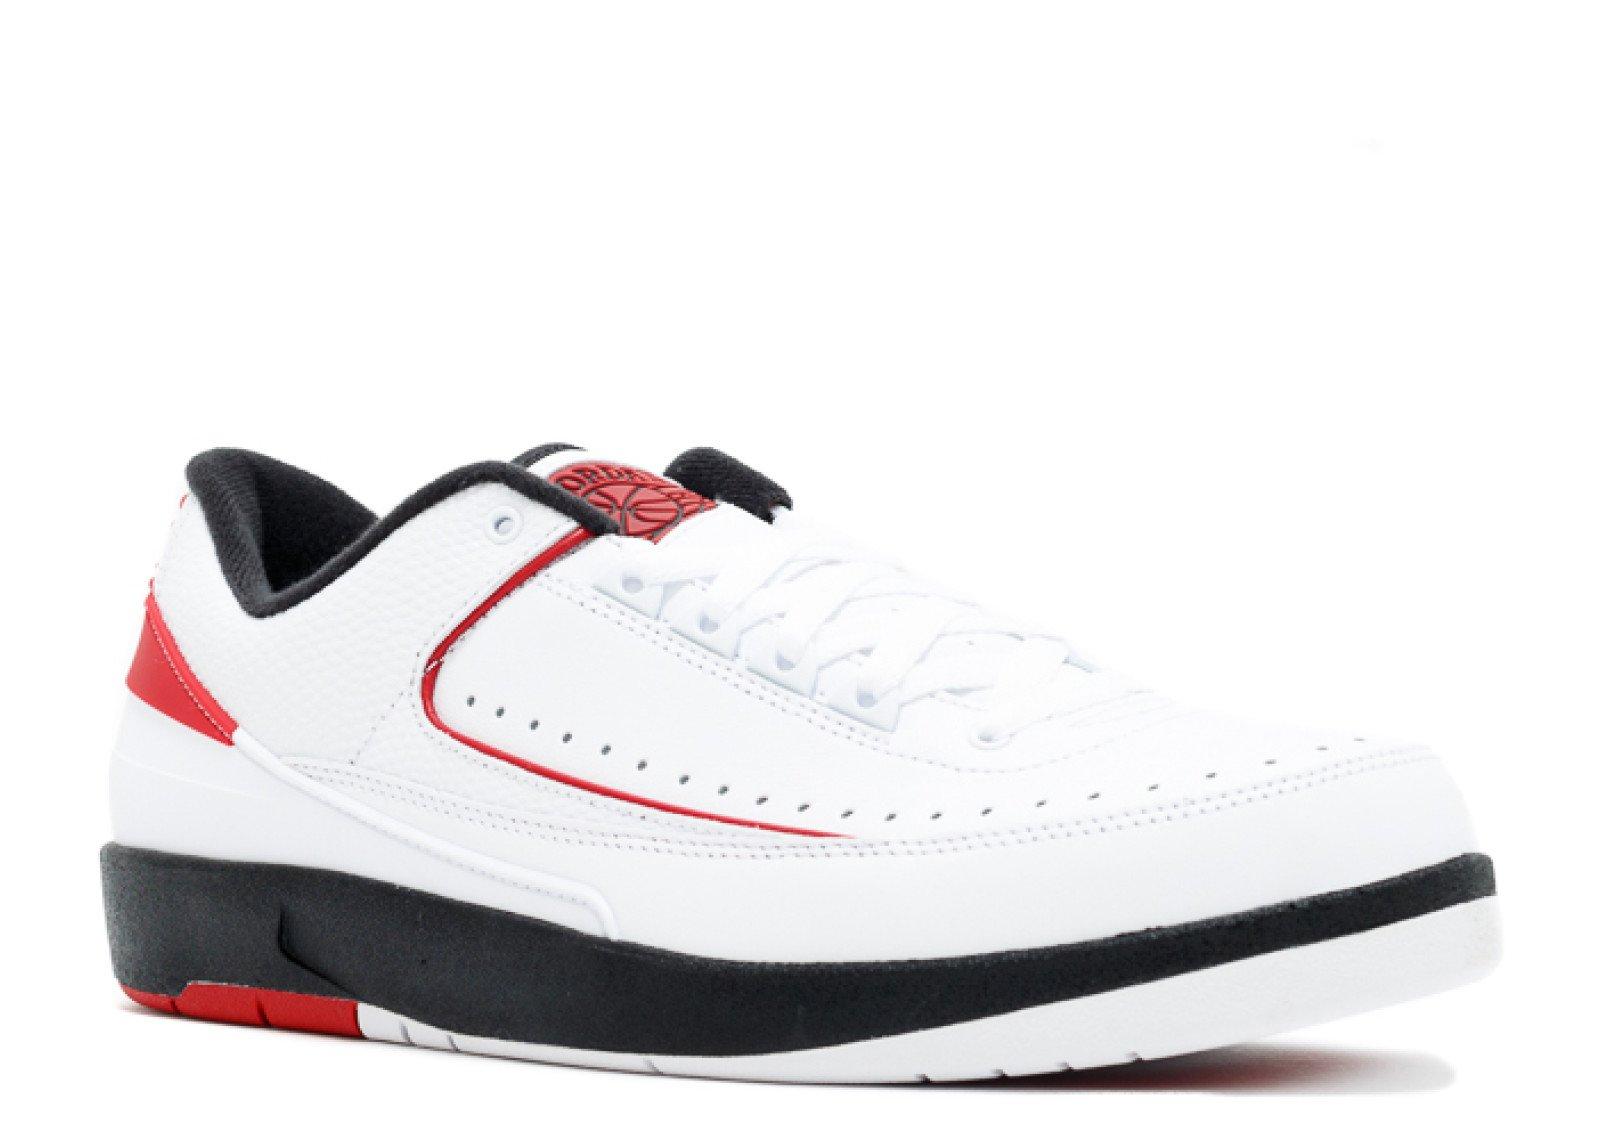 wholesale dealer 7b66d dc639 Air Jordan 2 Retro Low - 832819 101